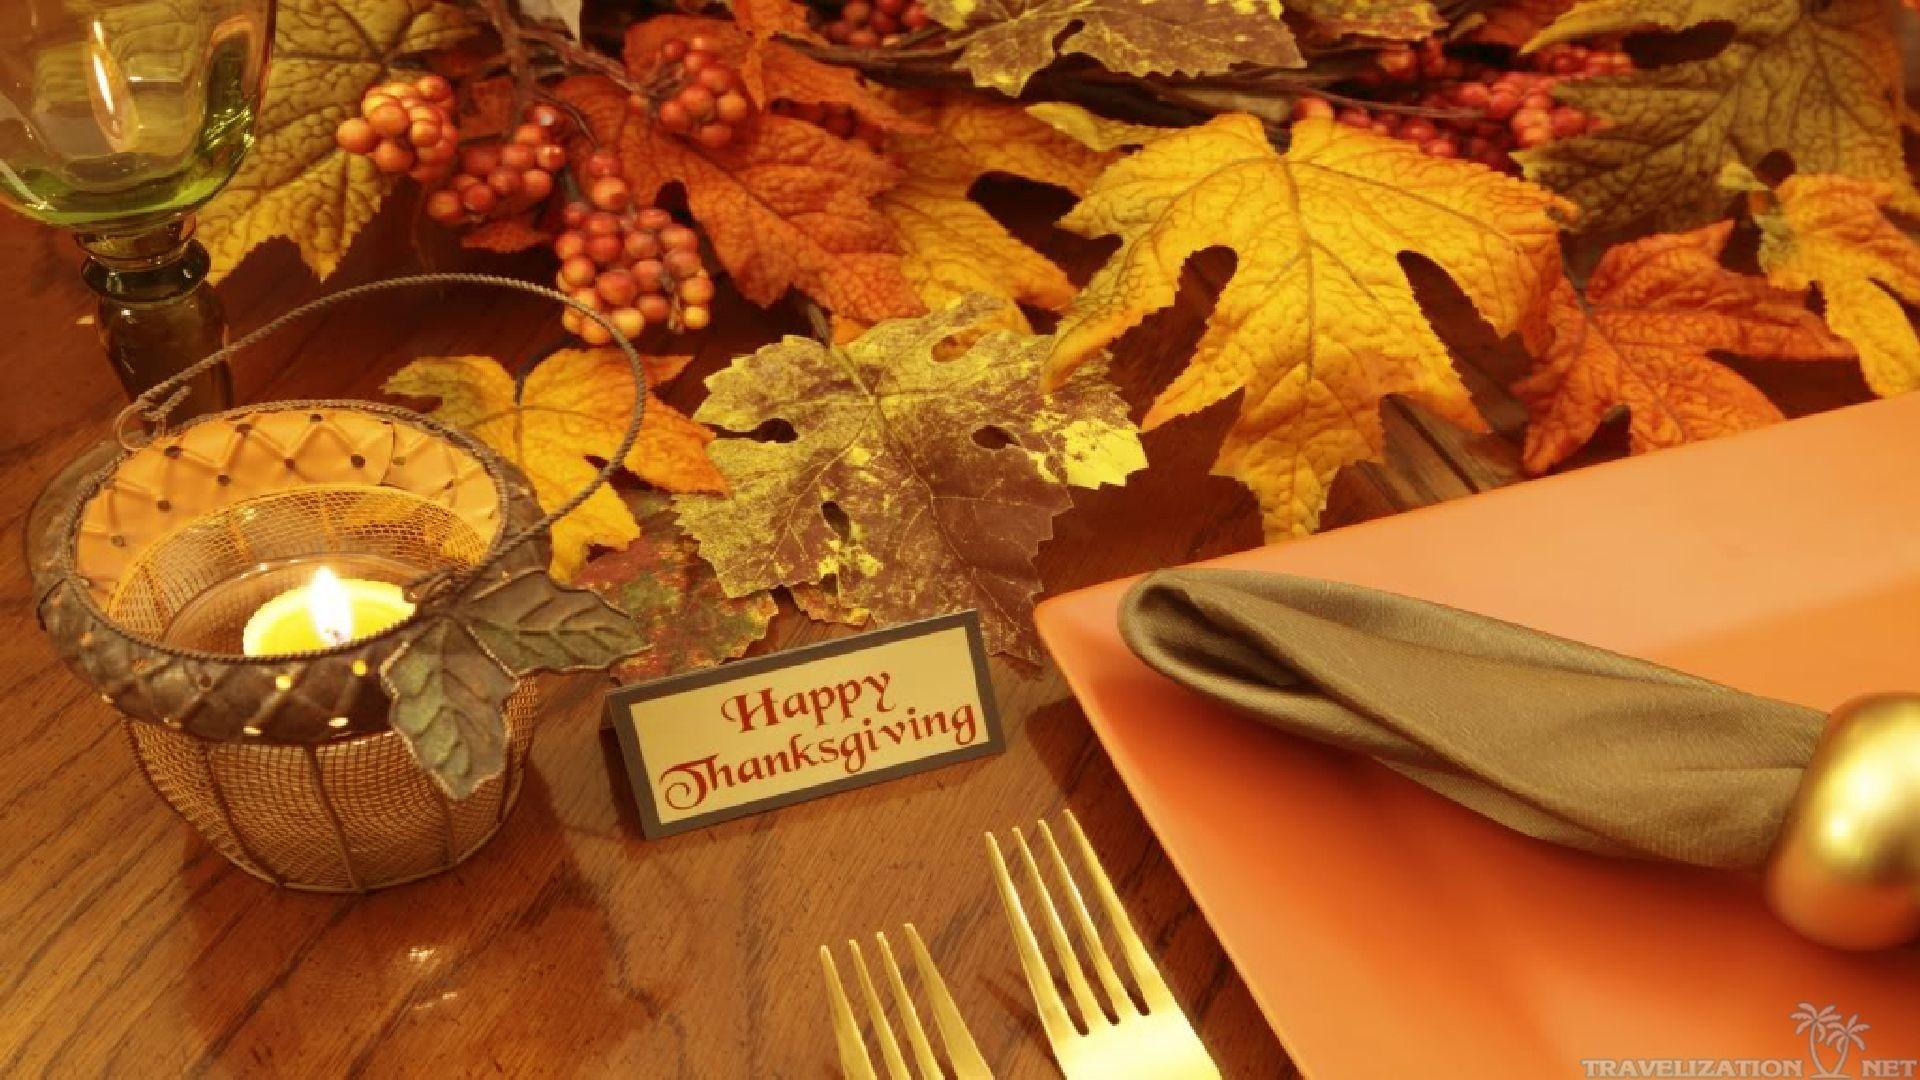 Thanksgiving Wallpaper 1920x1080 (73+ images)